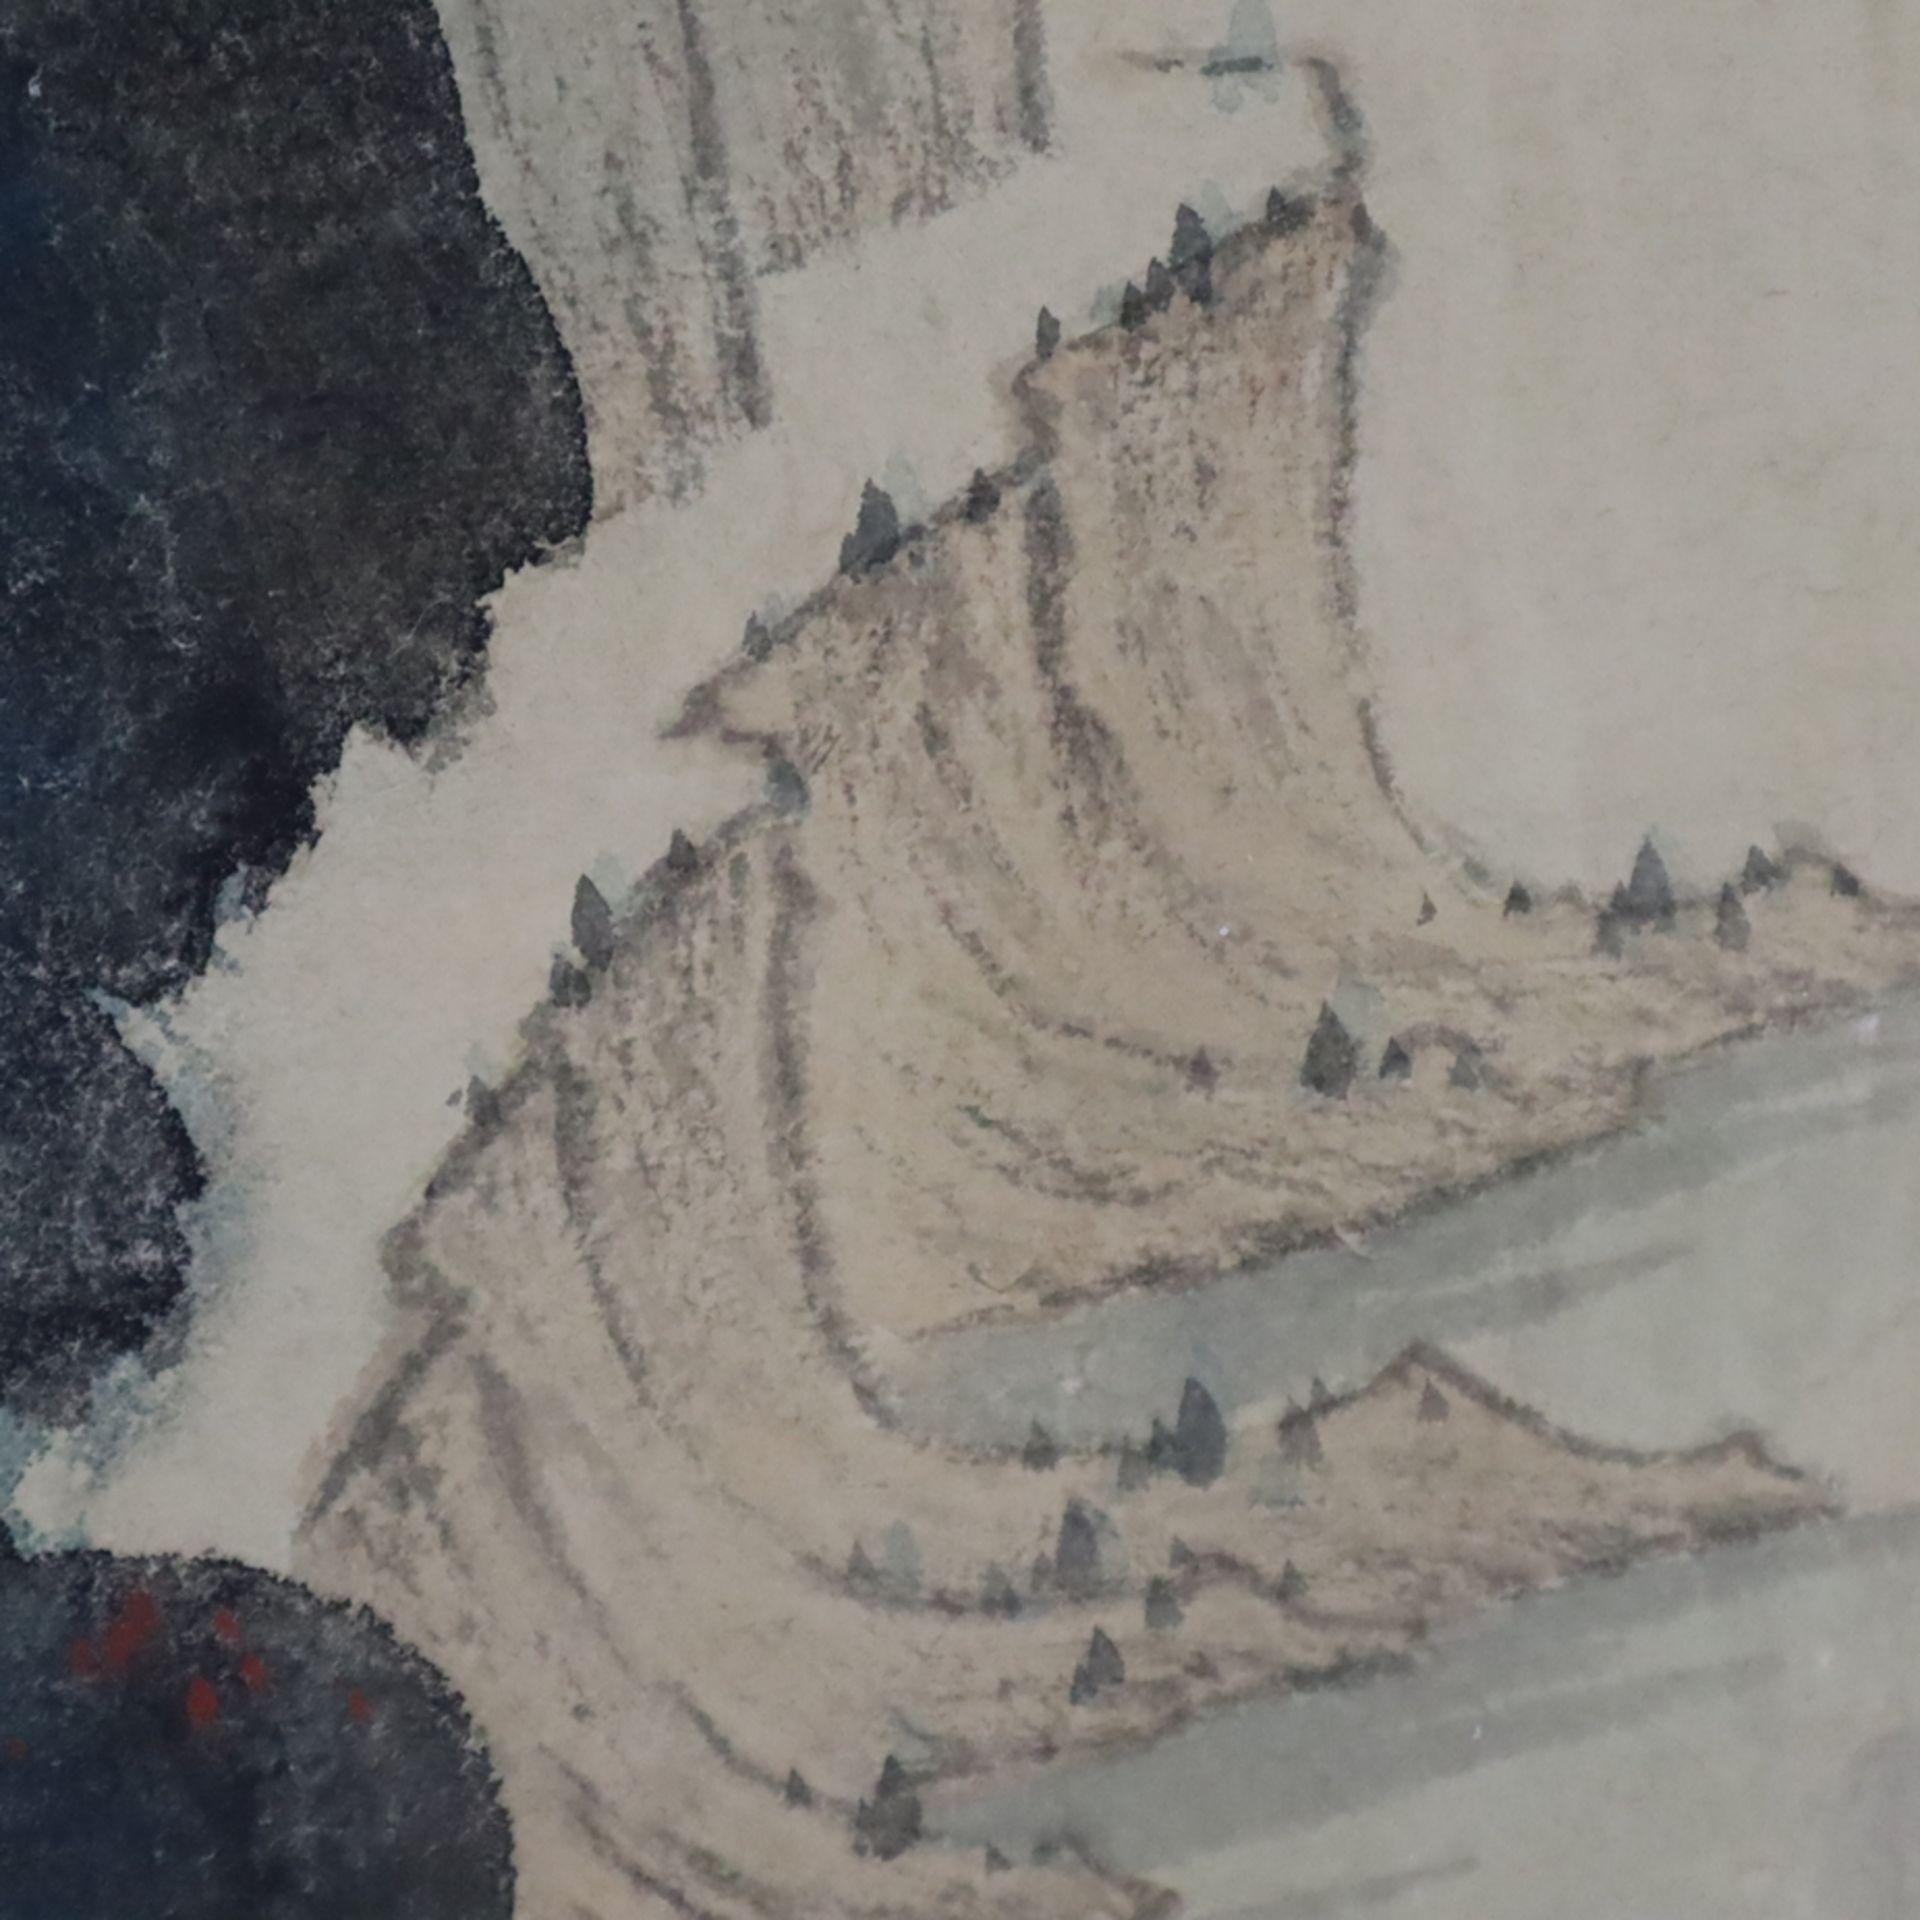 Chinesisches Rollbild - gesiegelt Zhang Daqian (   Chinese Hanging Scroll - sealed Zhang Daqian (18 - Image 12 of 18